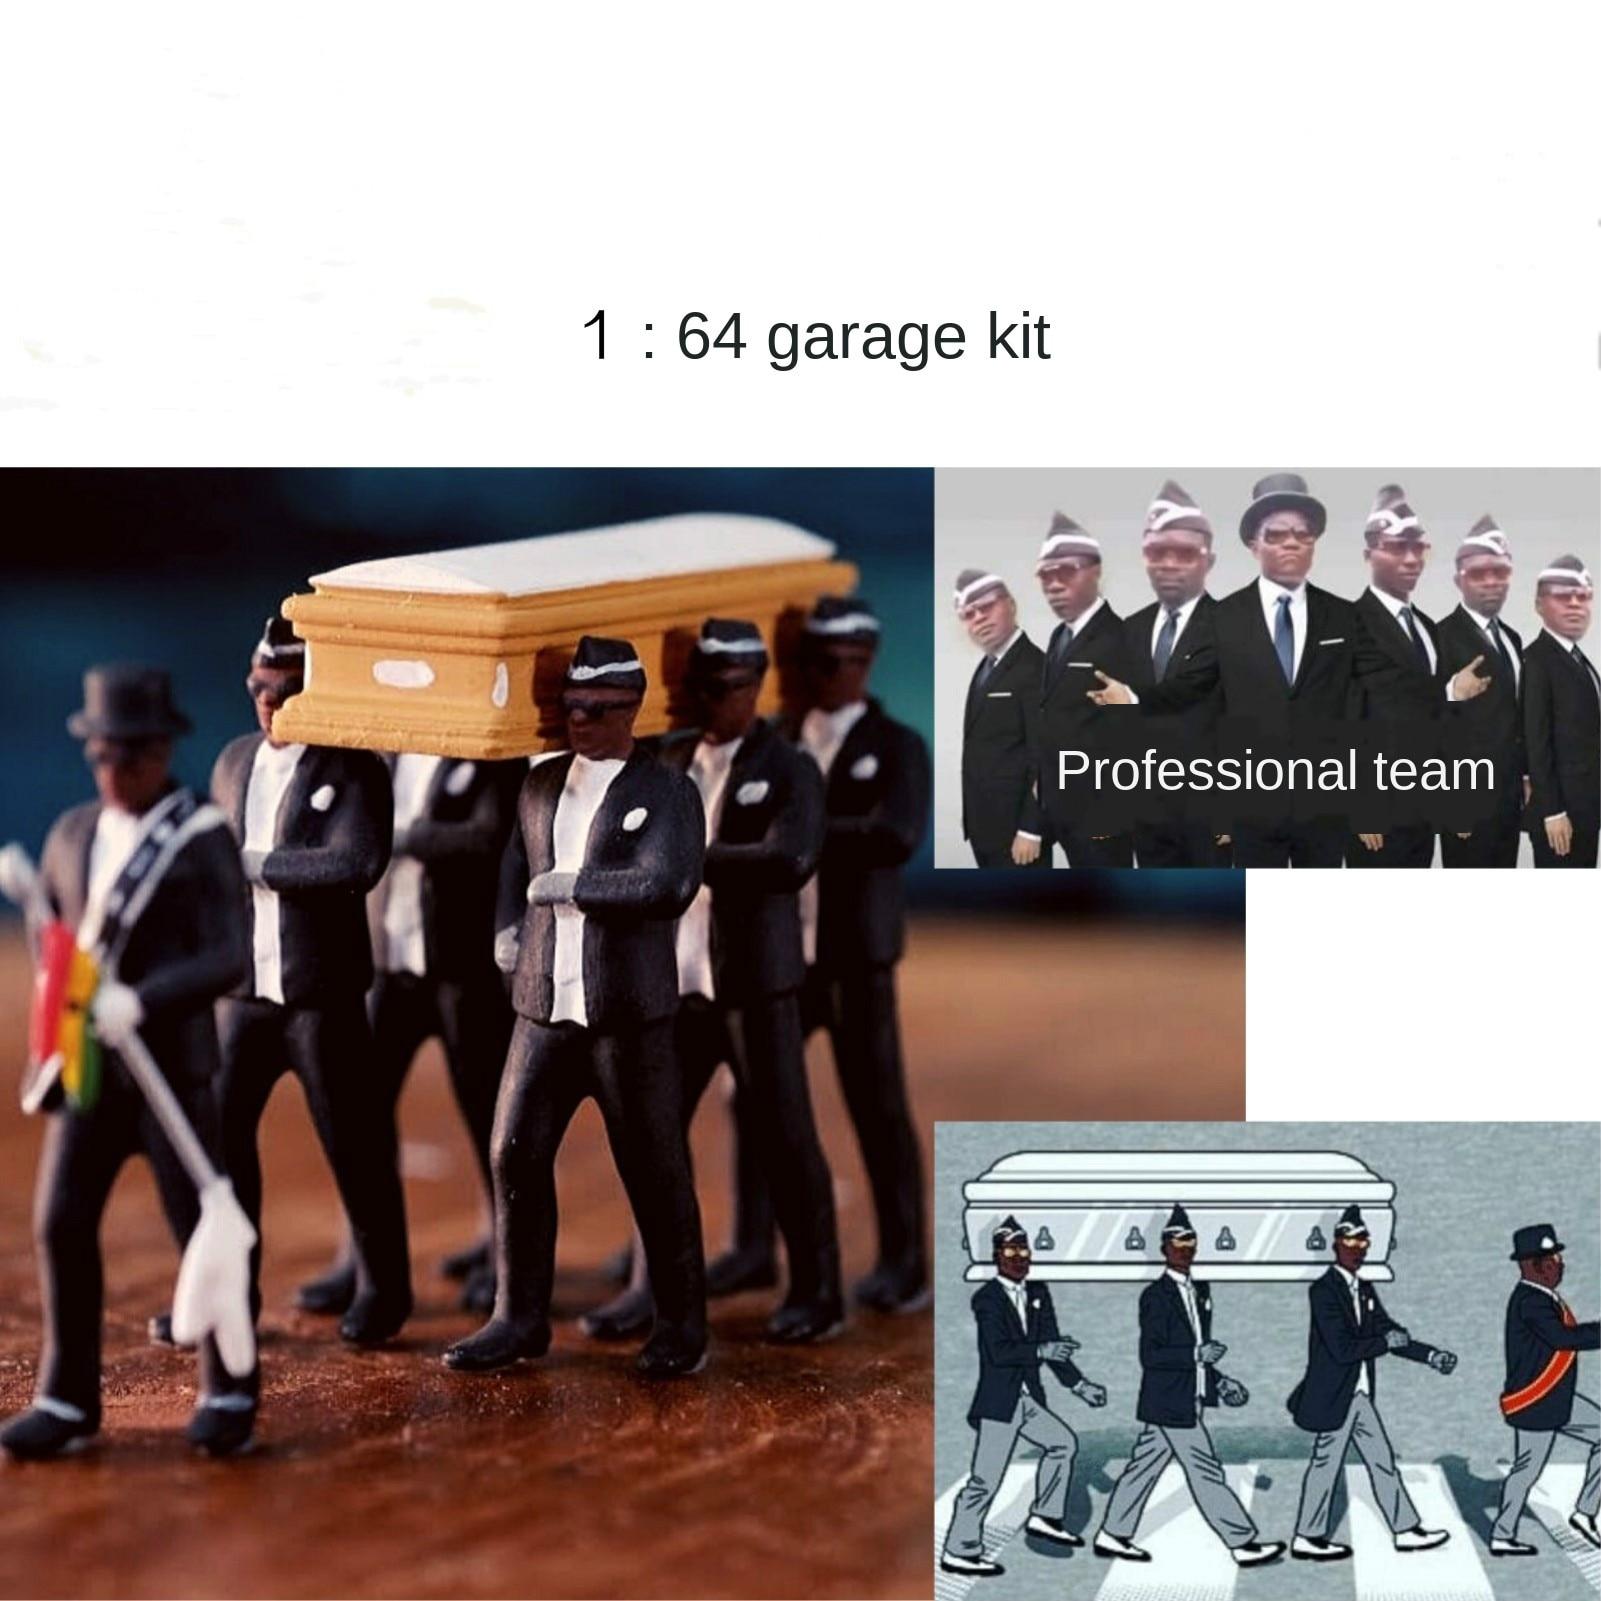 Cosplay Ghana Dancing Pallbearers Coffin Dance Figure Action Funeral Dancing Team Display Funny Accessories